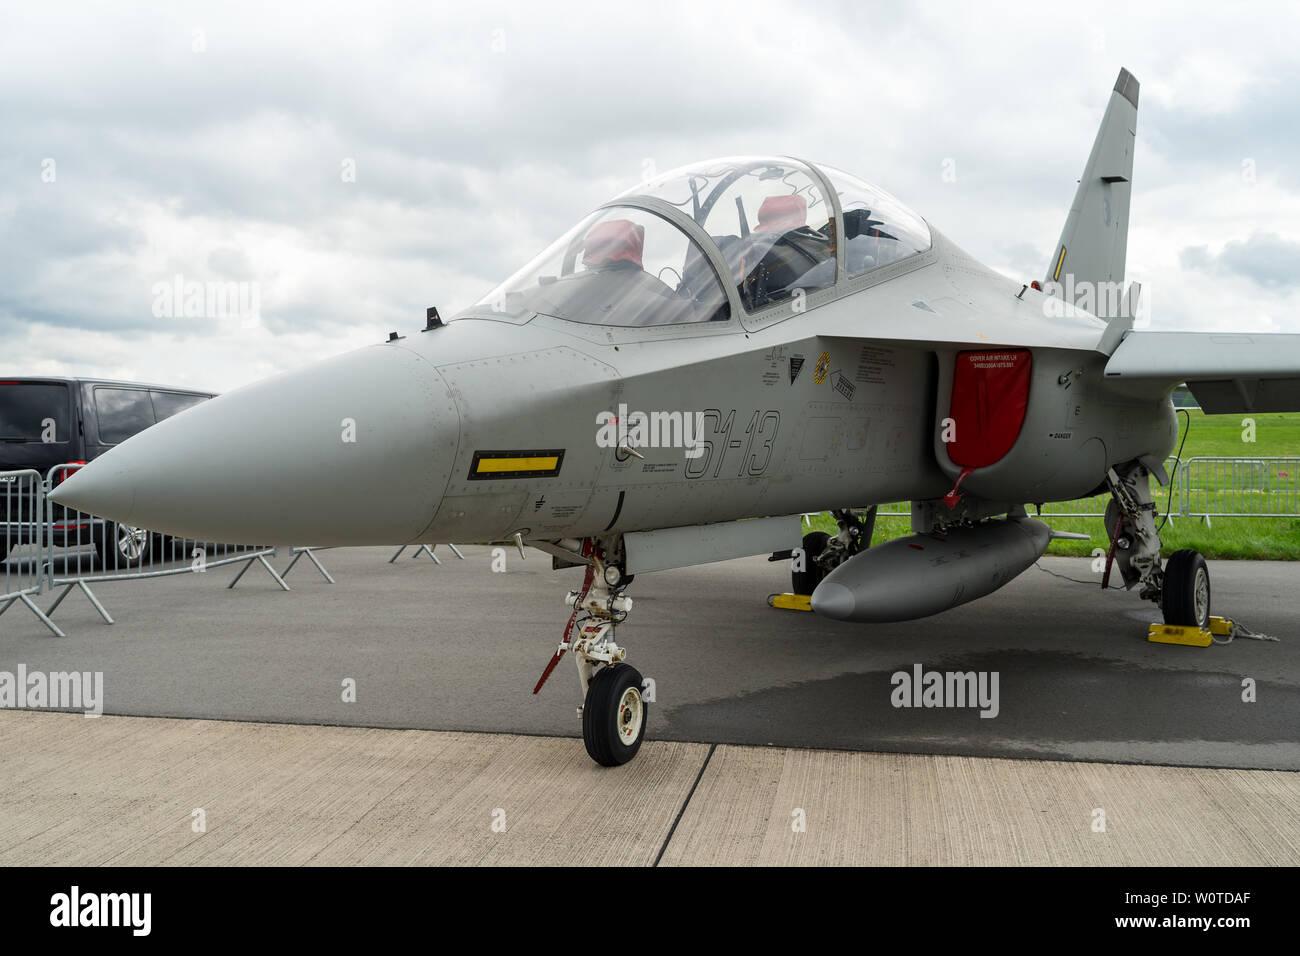 BERLIN - APRIL 26, 2018: Space Pavilion. Advanced jet trainer Alenia Aermacchi M-346 Master. Italian Air Force. Exhibition ILA Berlin Air Show 2018 - Stock Image